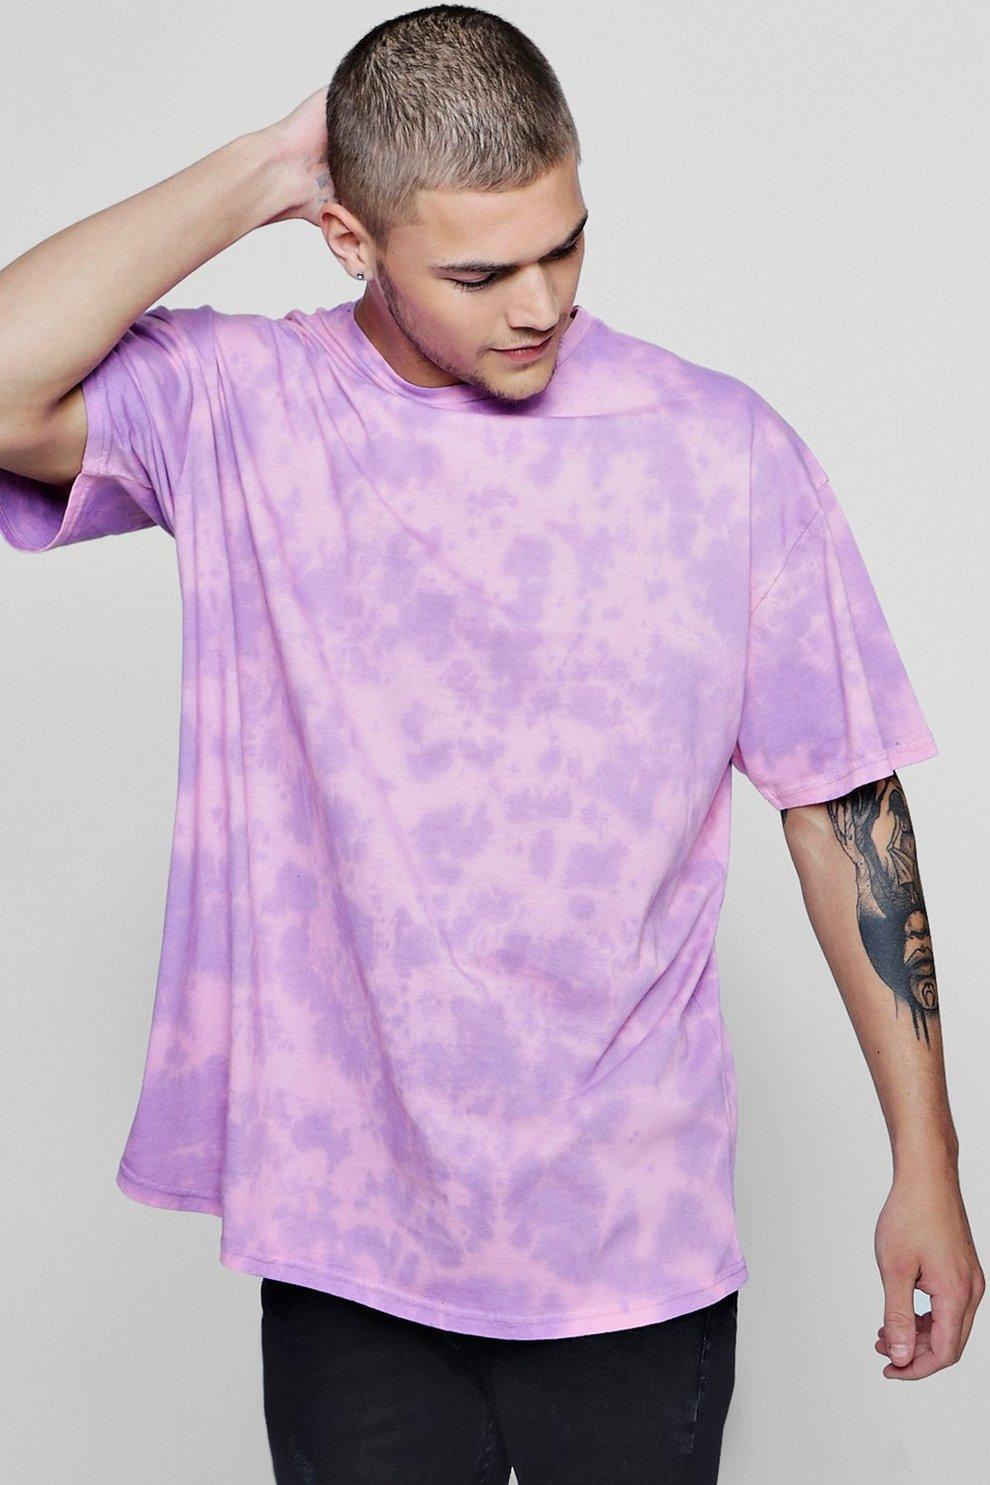 Effetto Dye Tie Boohoo shirt Magliette T Oversize Rosa ybf7vIYg6